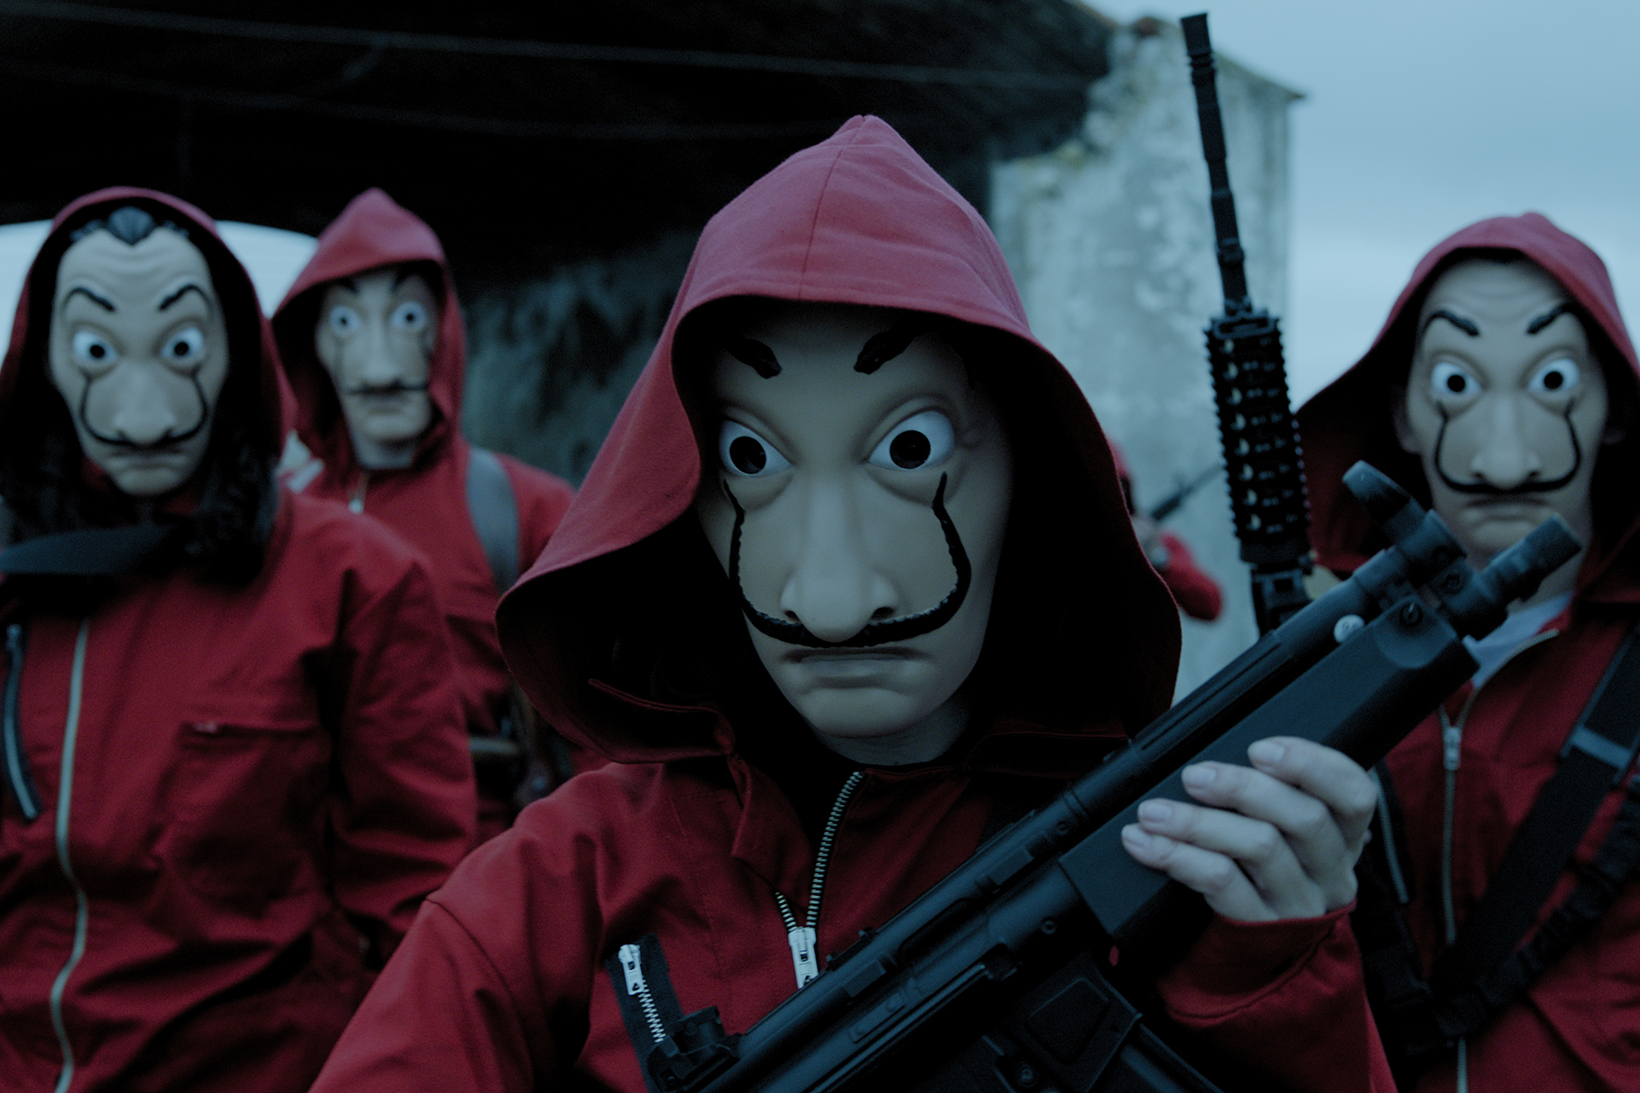 Netflix Money Heist Immersive Experience Tv Show La Casa de Papel